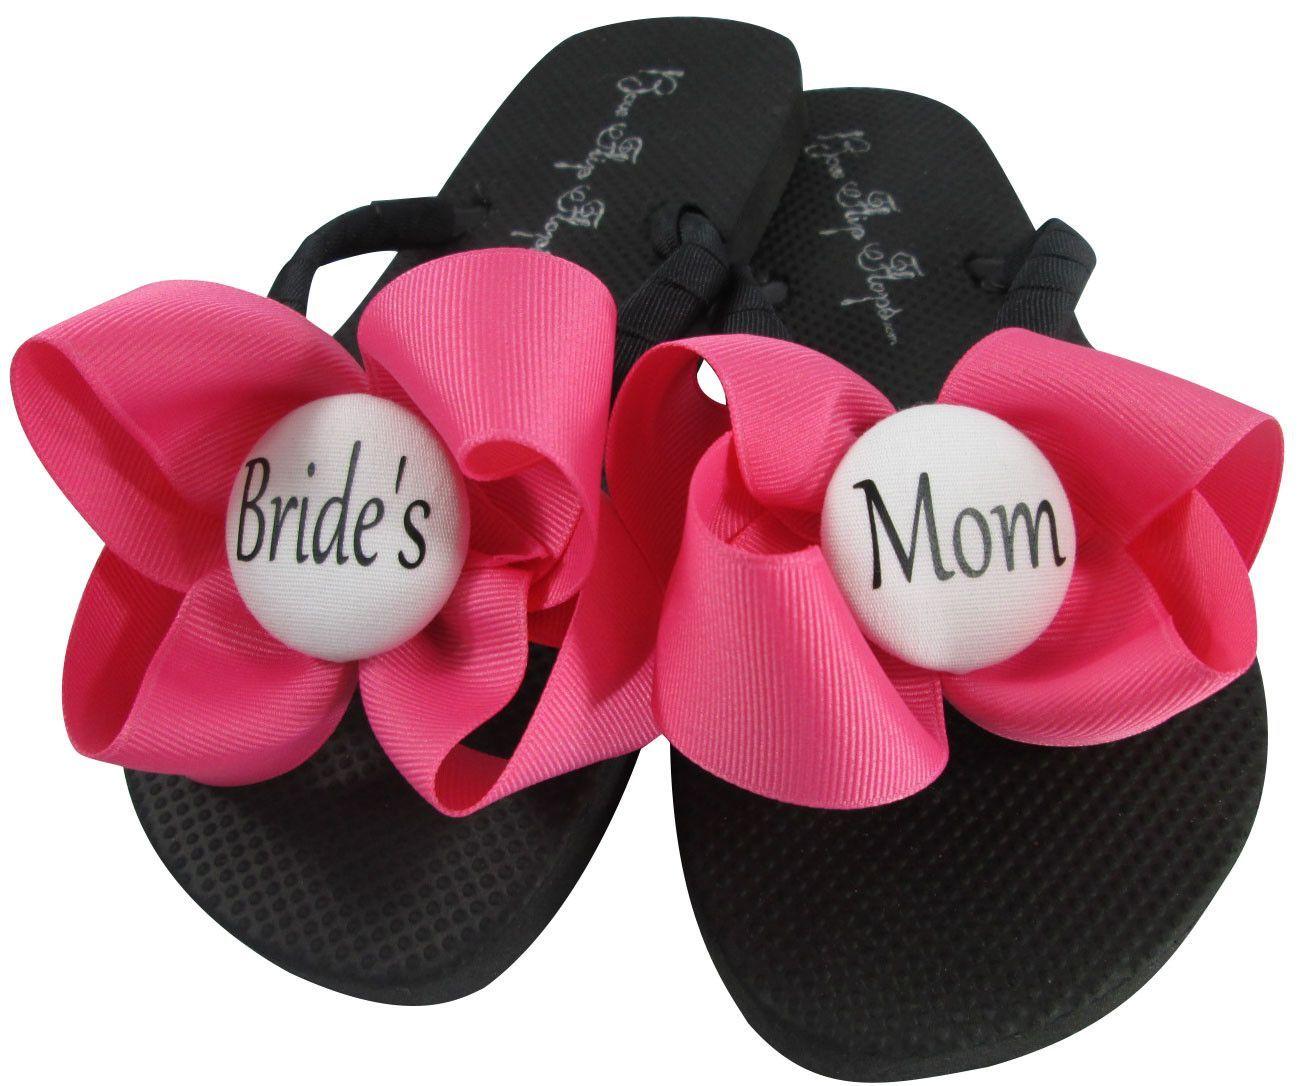 9f4968125e4128 hot women shoes rocktheflops wedding flip flops wedges for bride ivory flip  flops beach new arrive 18e60 adb49